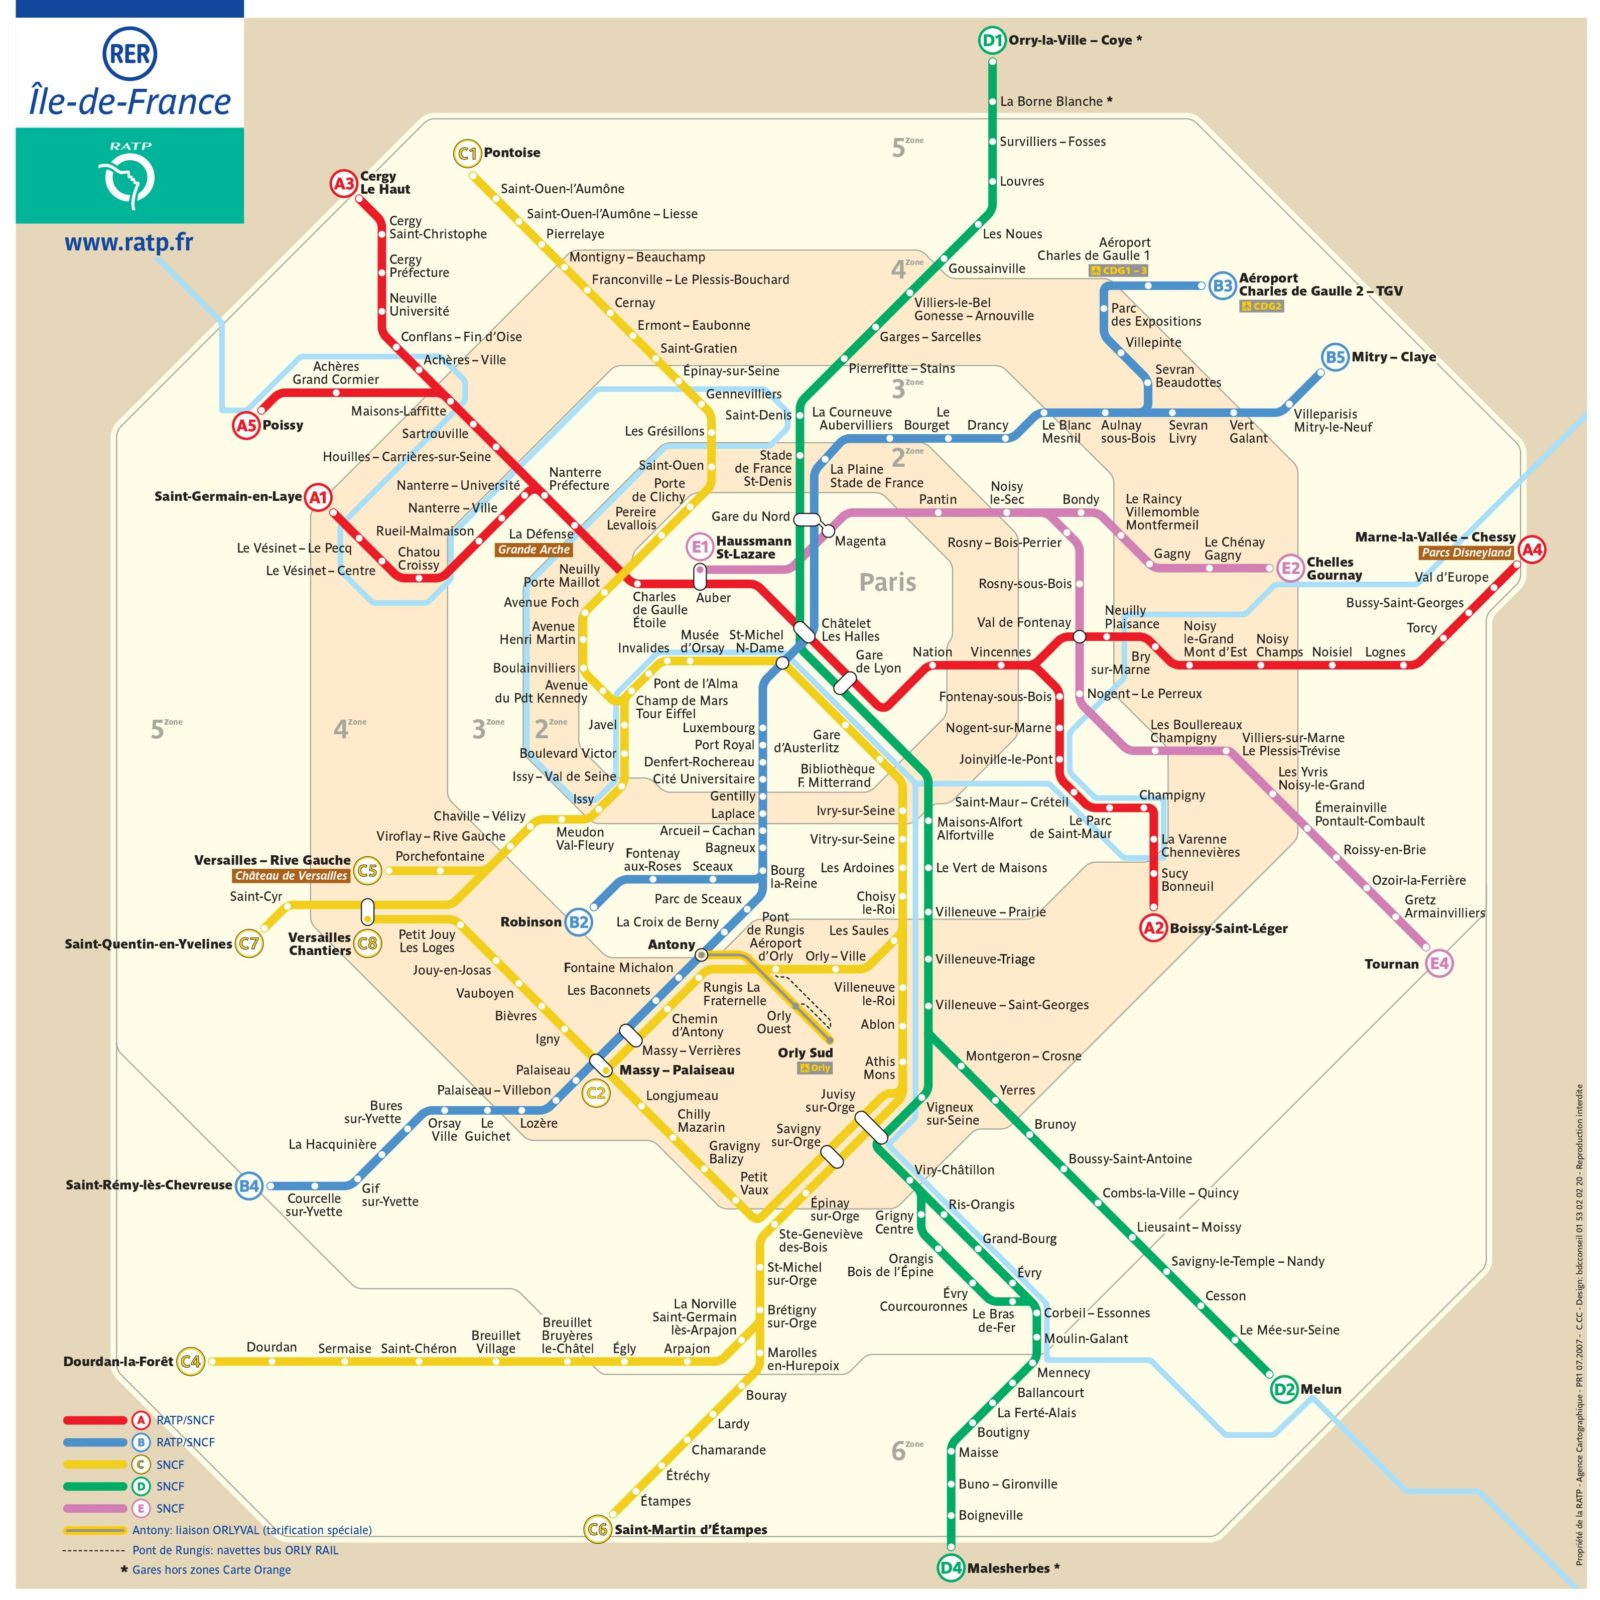 Карта RER в Париже